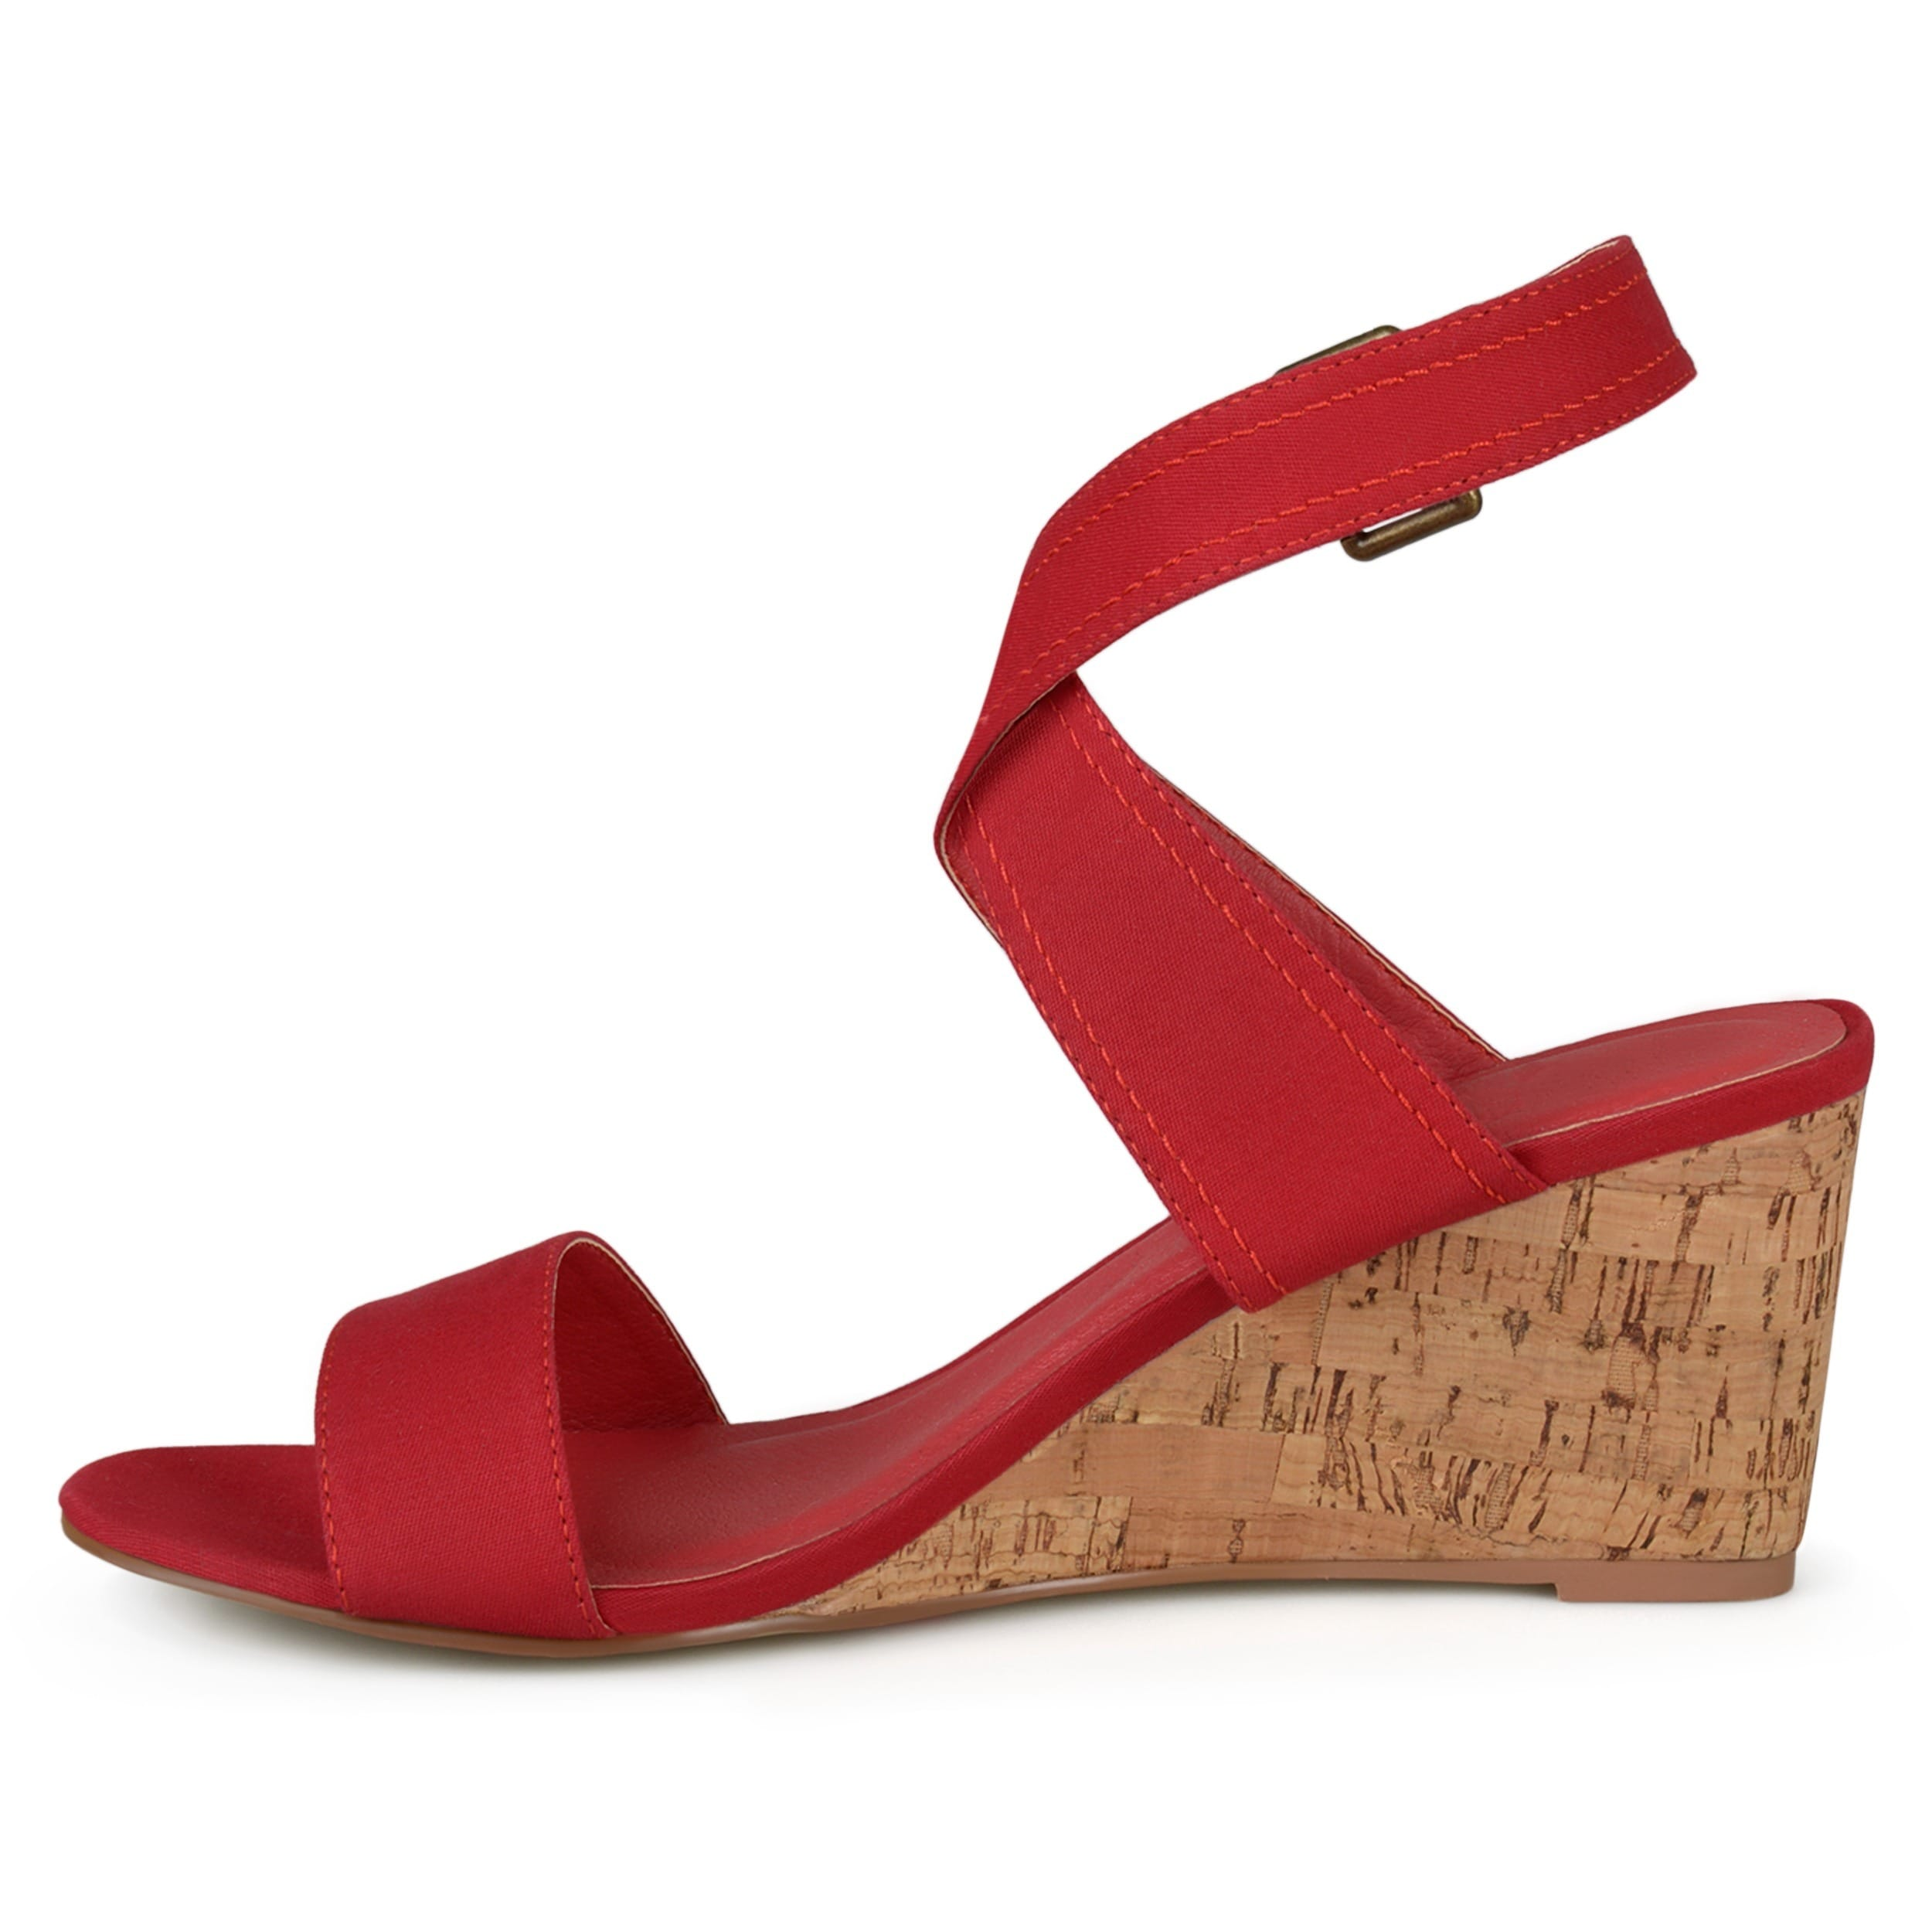 Journee Collection Kaylee ... Women's Wedge Sandals 758Dif